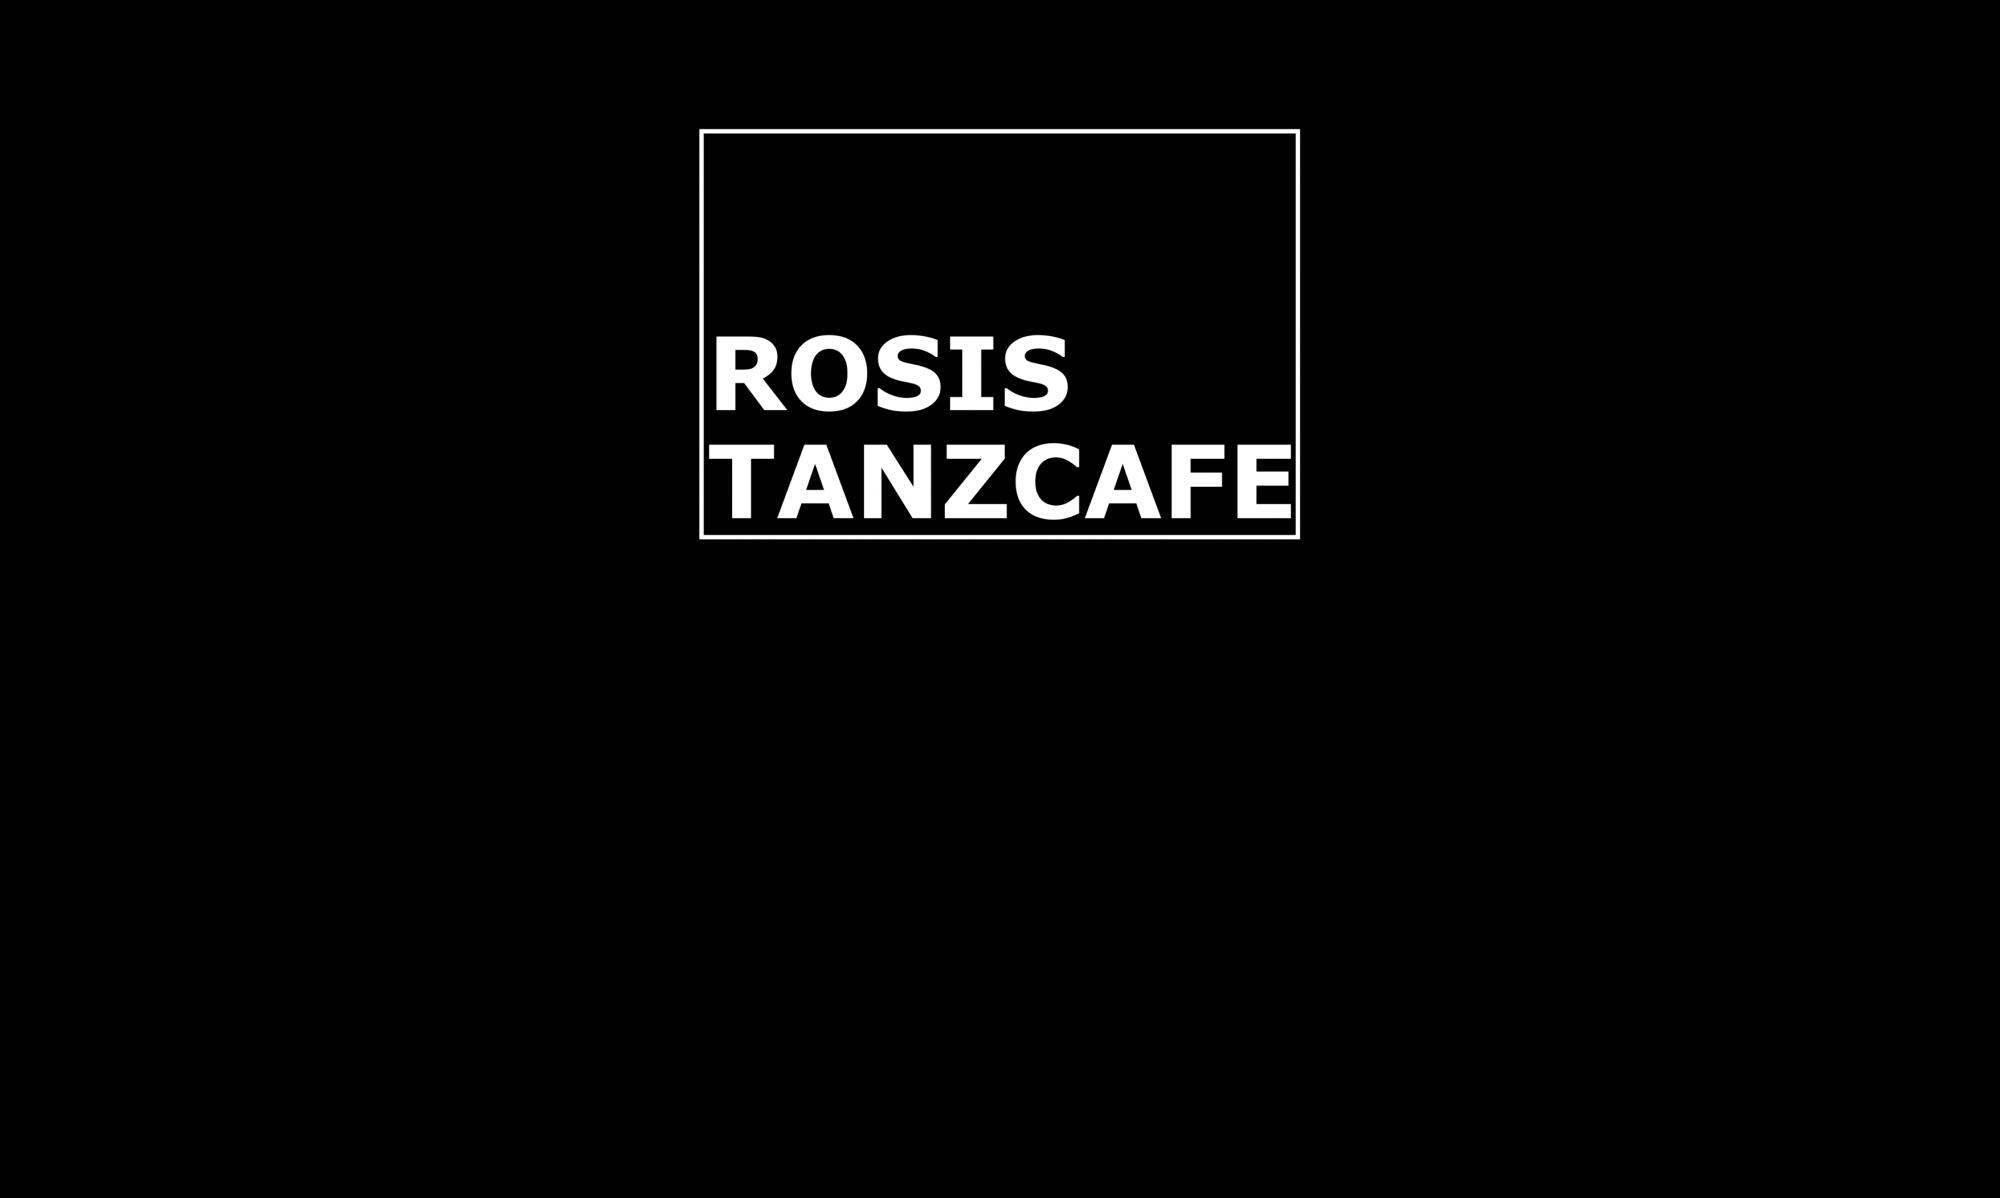 Rosis Tanzcafe